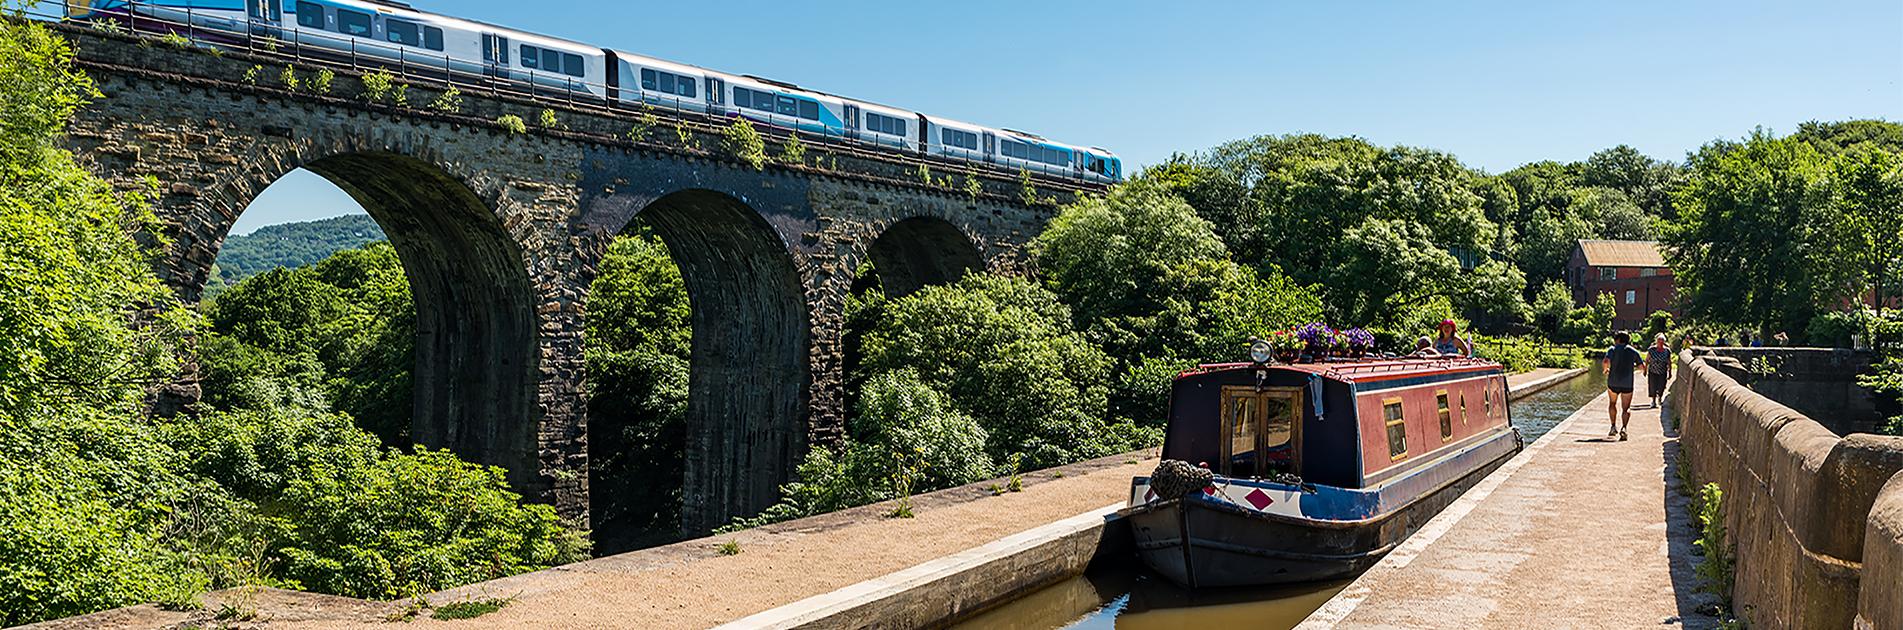 Kanal-akvædukt i England